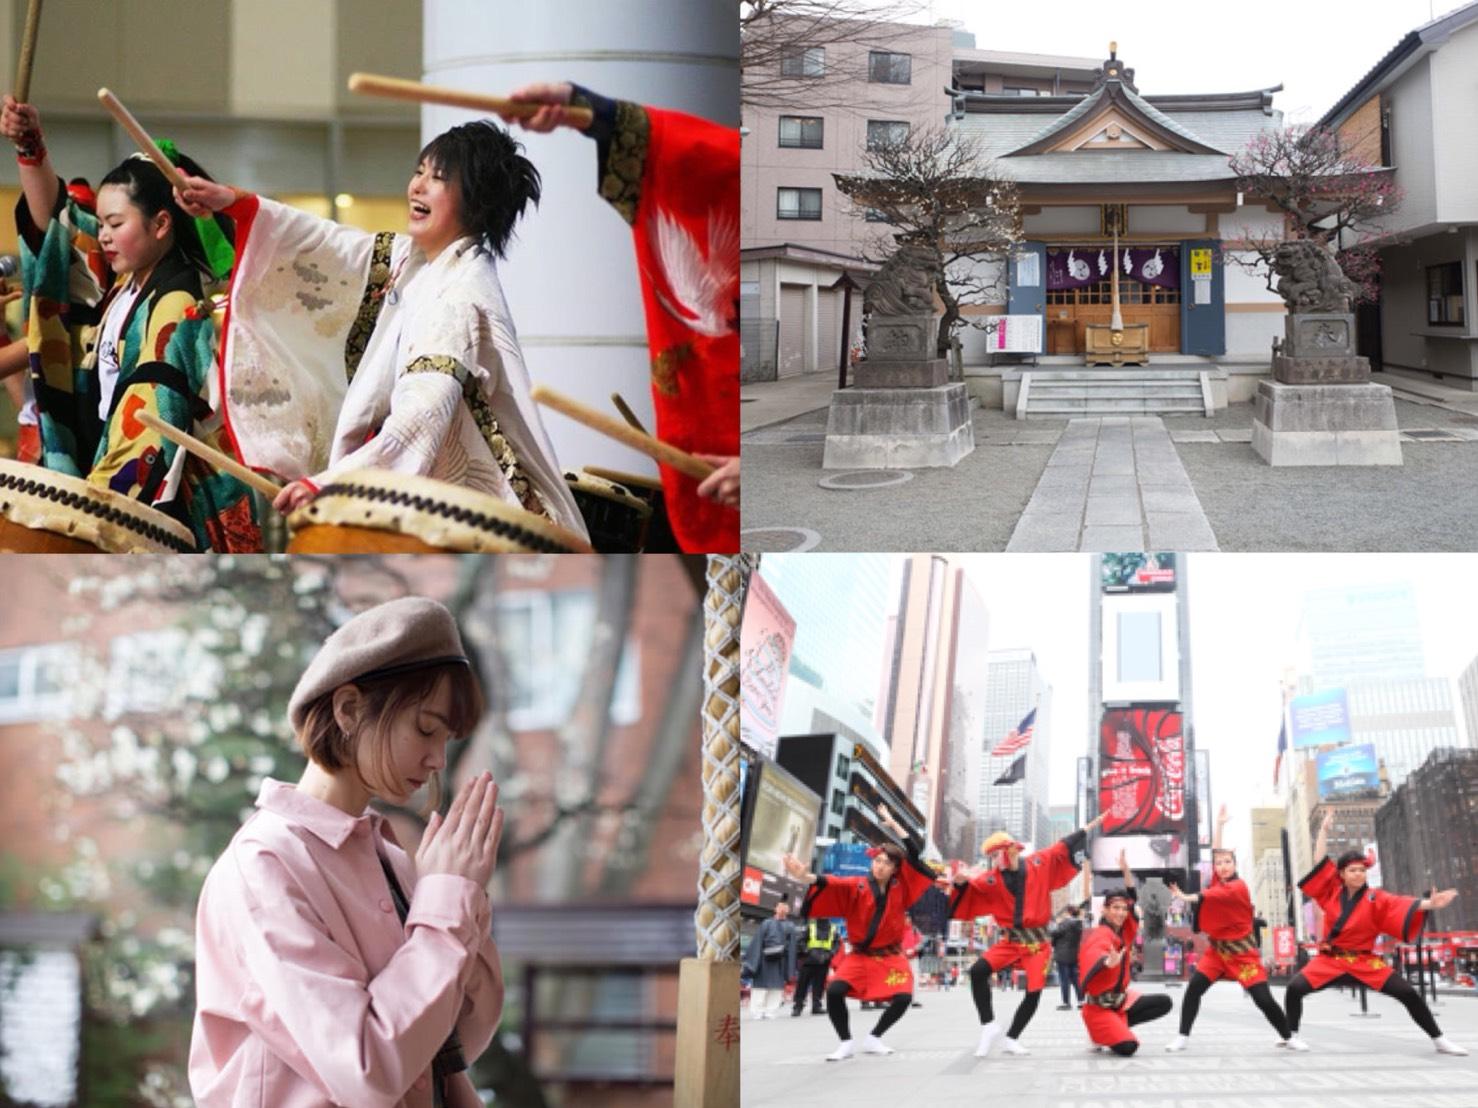 【MOSHI FES 2018/穩田神社】日本傳統藝能和祭典體驗!MOSHI FES穩田神社內容介紹 MOSHI FES、MOSHI MOSHI NIPPON、在原宿、在澀谷、